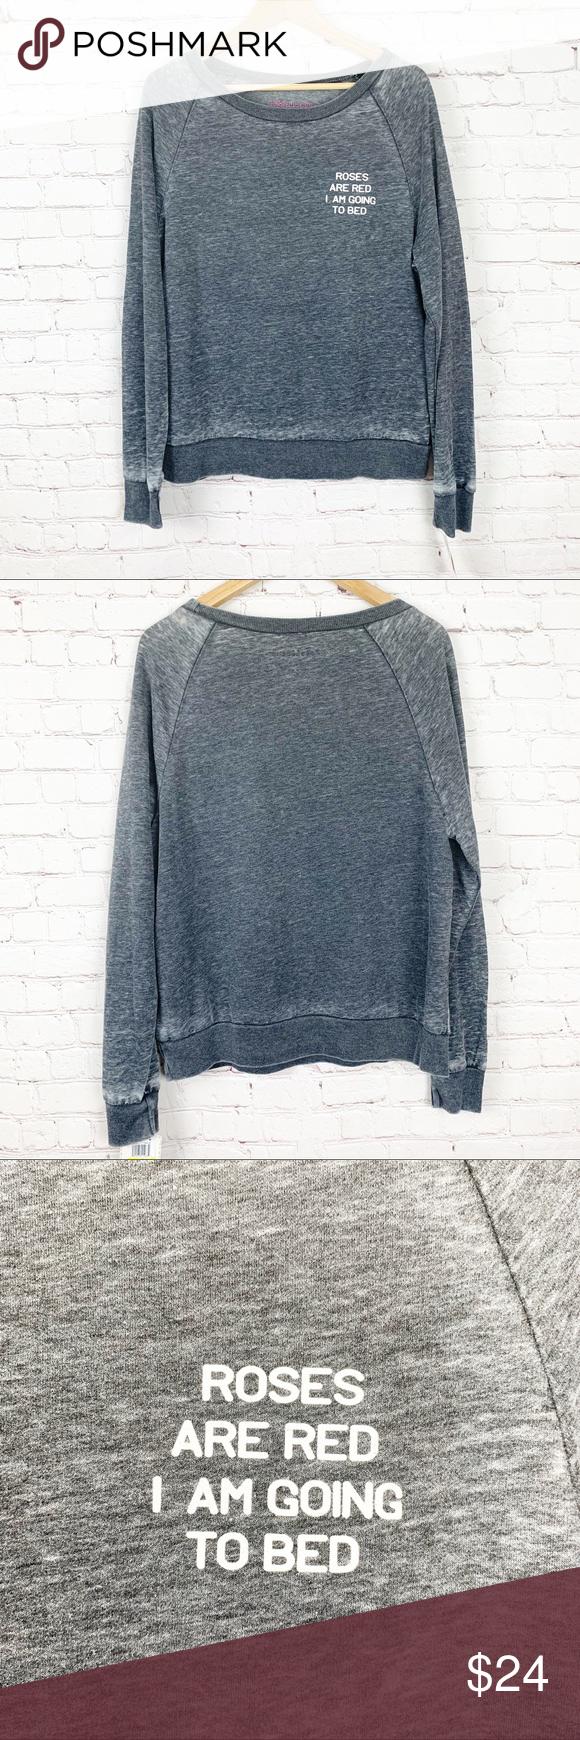 Nwt Rebellious One Crewneck Sweatshirt Clothes Design Crew Neck Sweatshirt Baggy Sweatshirts [ 1740 x 580 Pixel ]